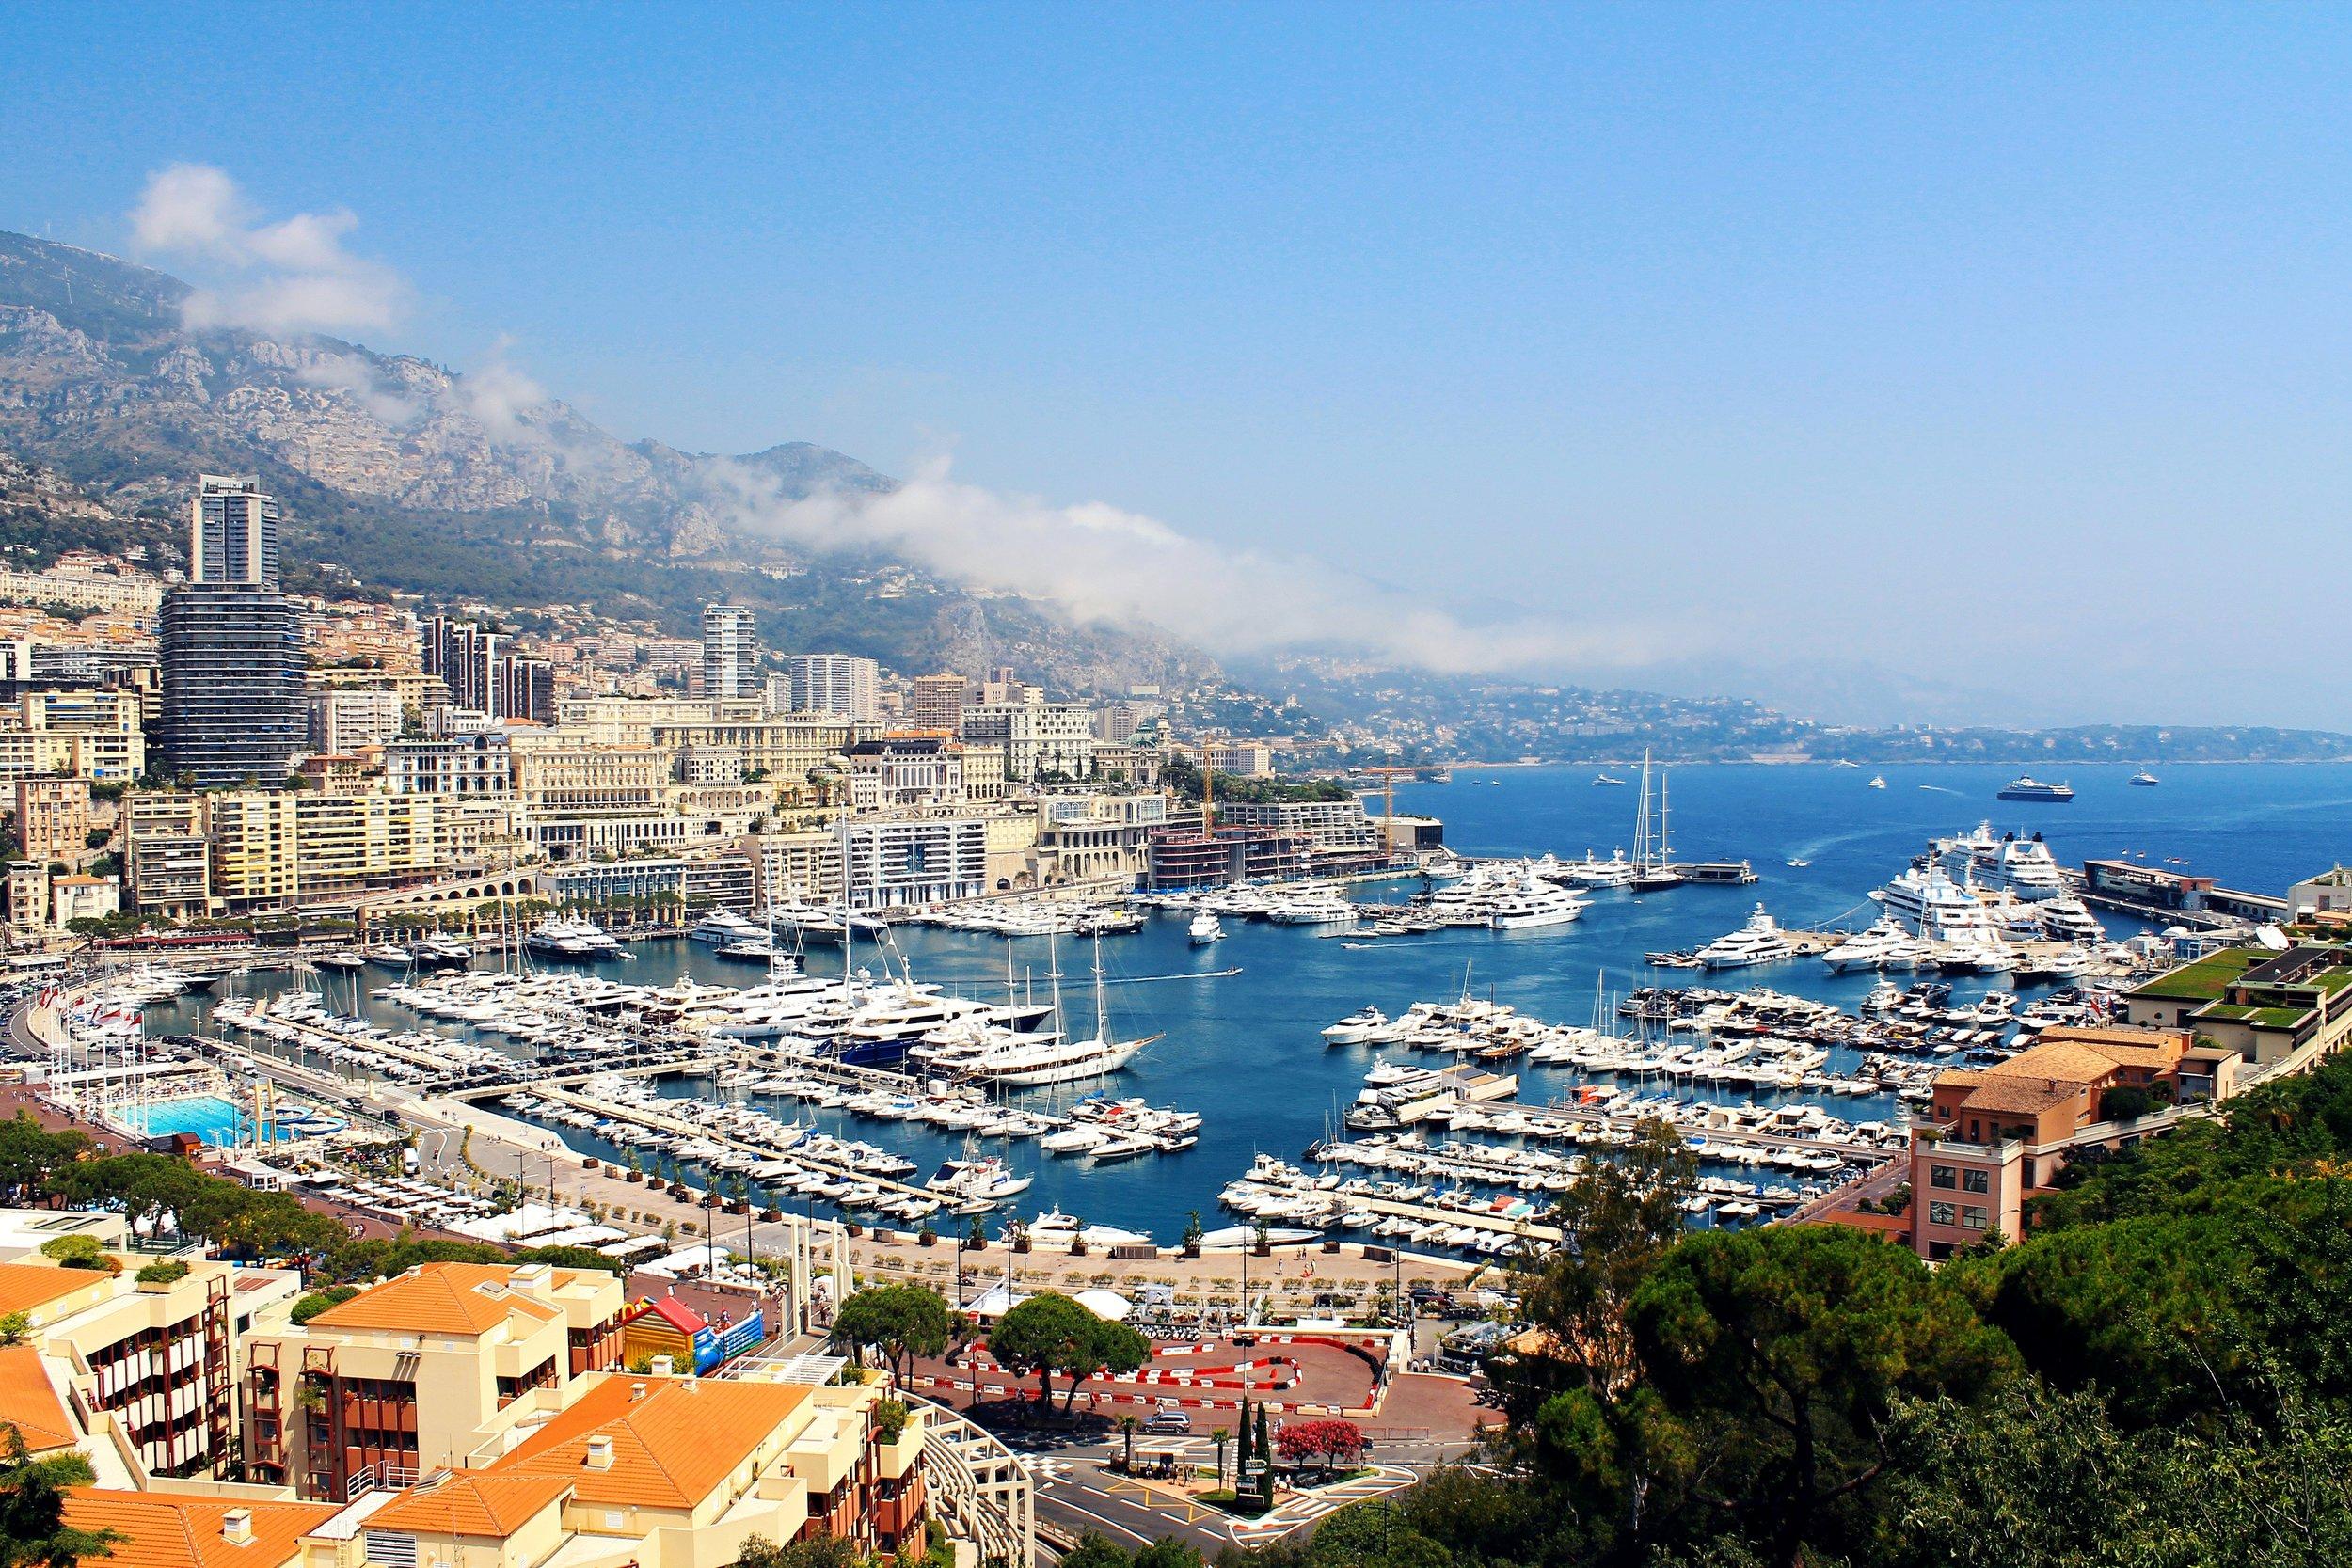 Monaco Formula 1 Grand Prix 2020 - Monte Carlo, MonacoFriday 22 - Sunday 24 May 2020 (TBC)